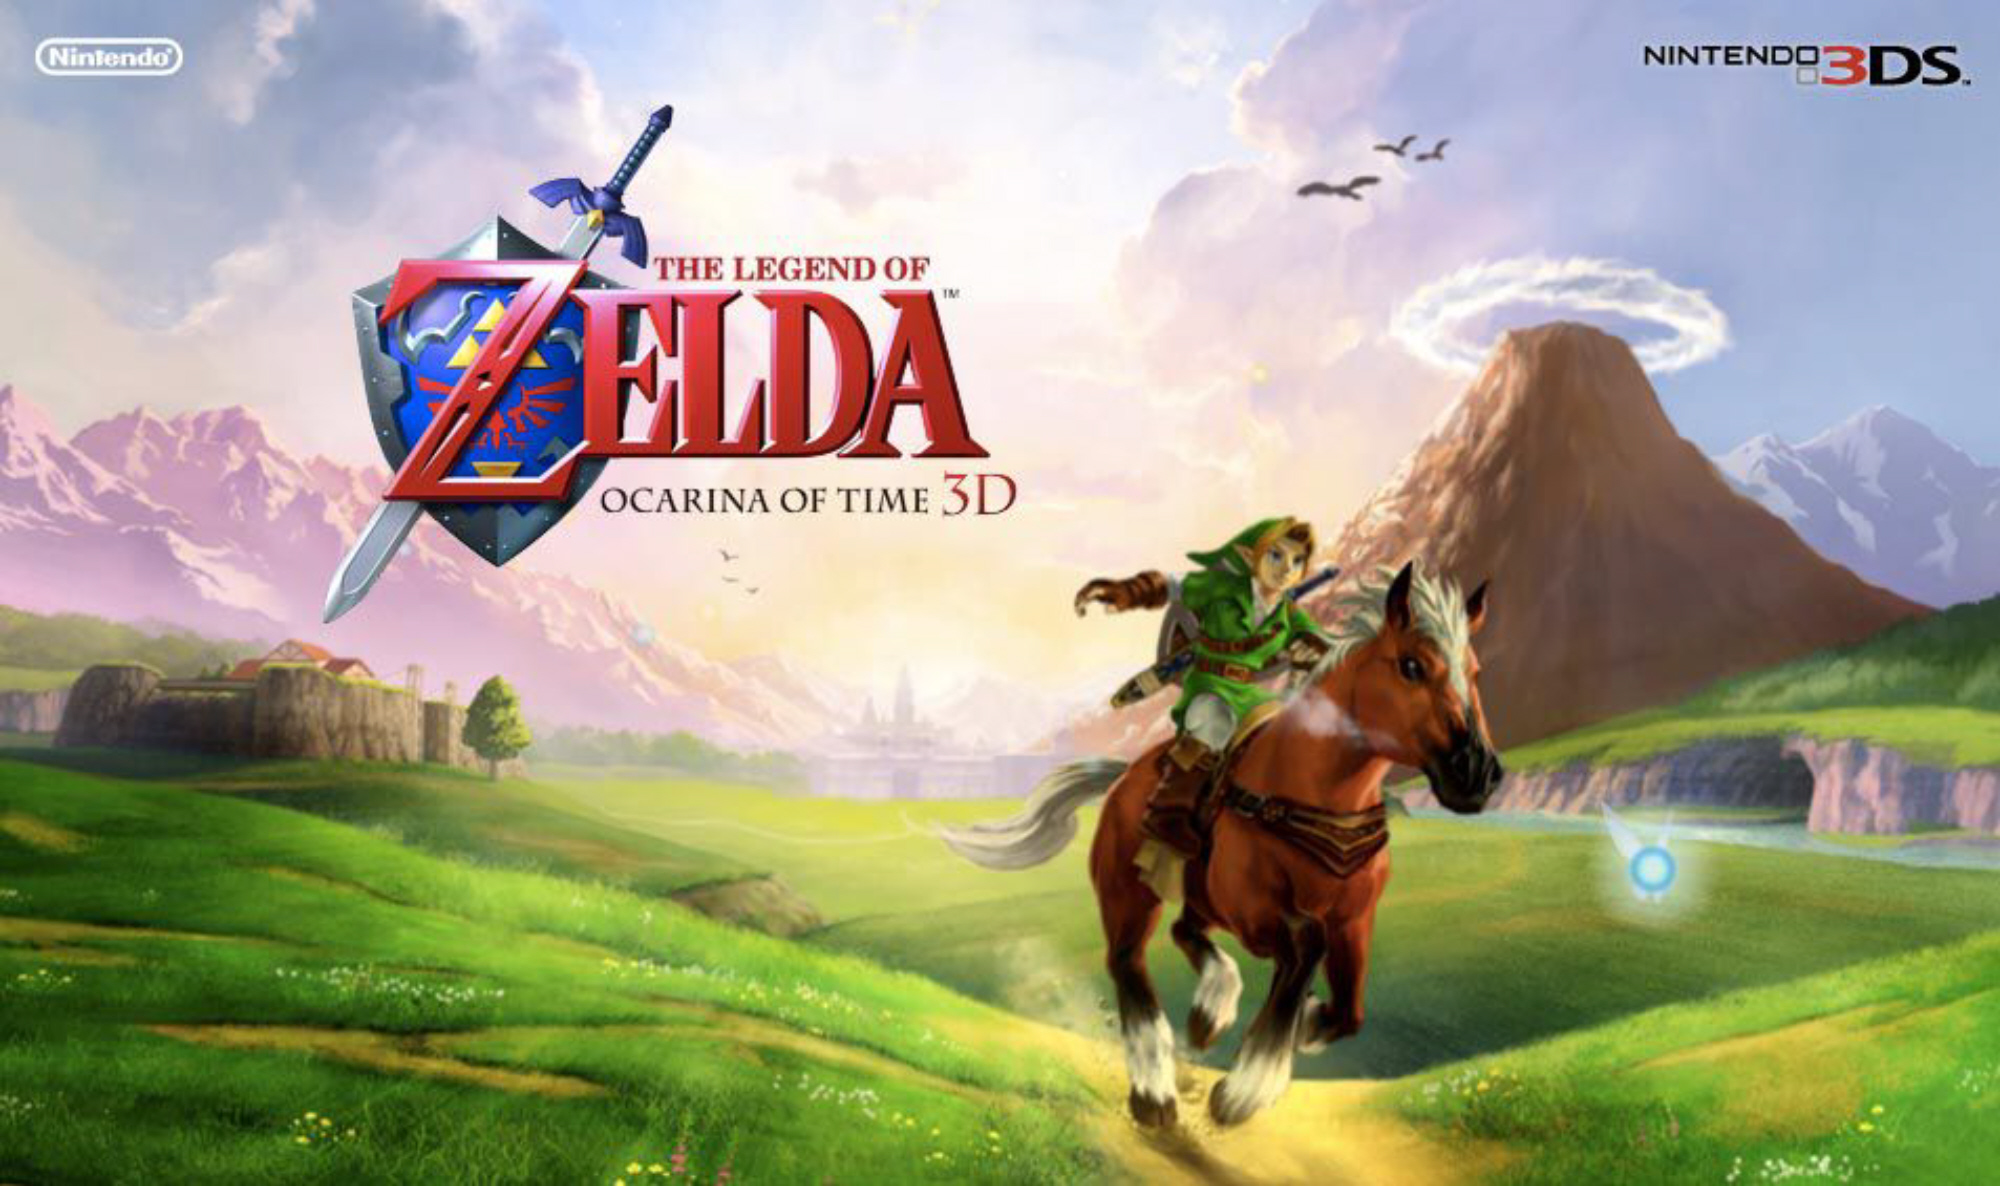 Ocarina-of-Time-3D-legend-of-zelda-ocarina-of-time